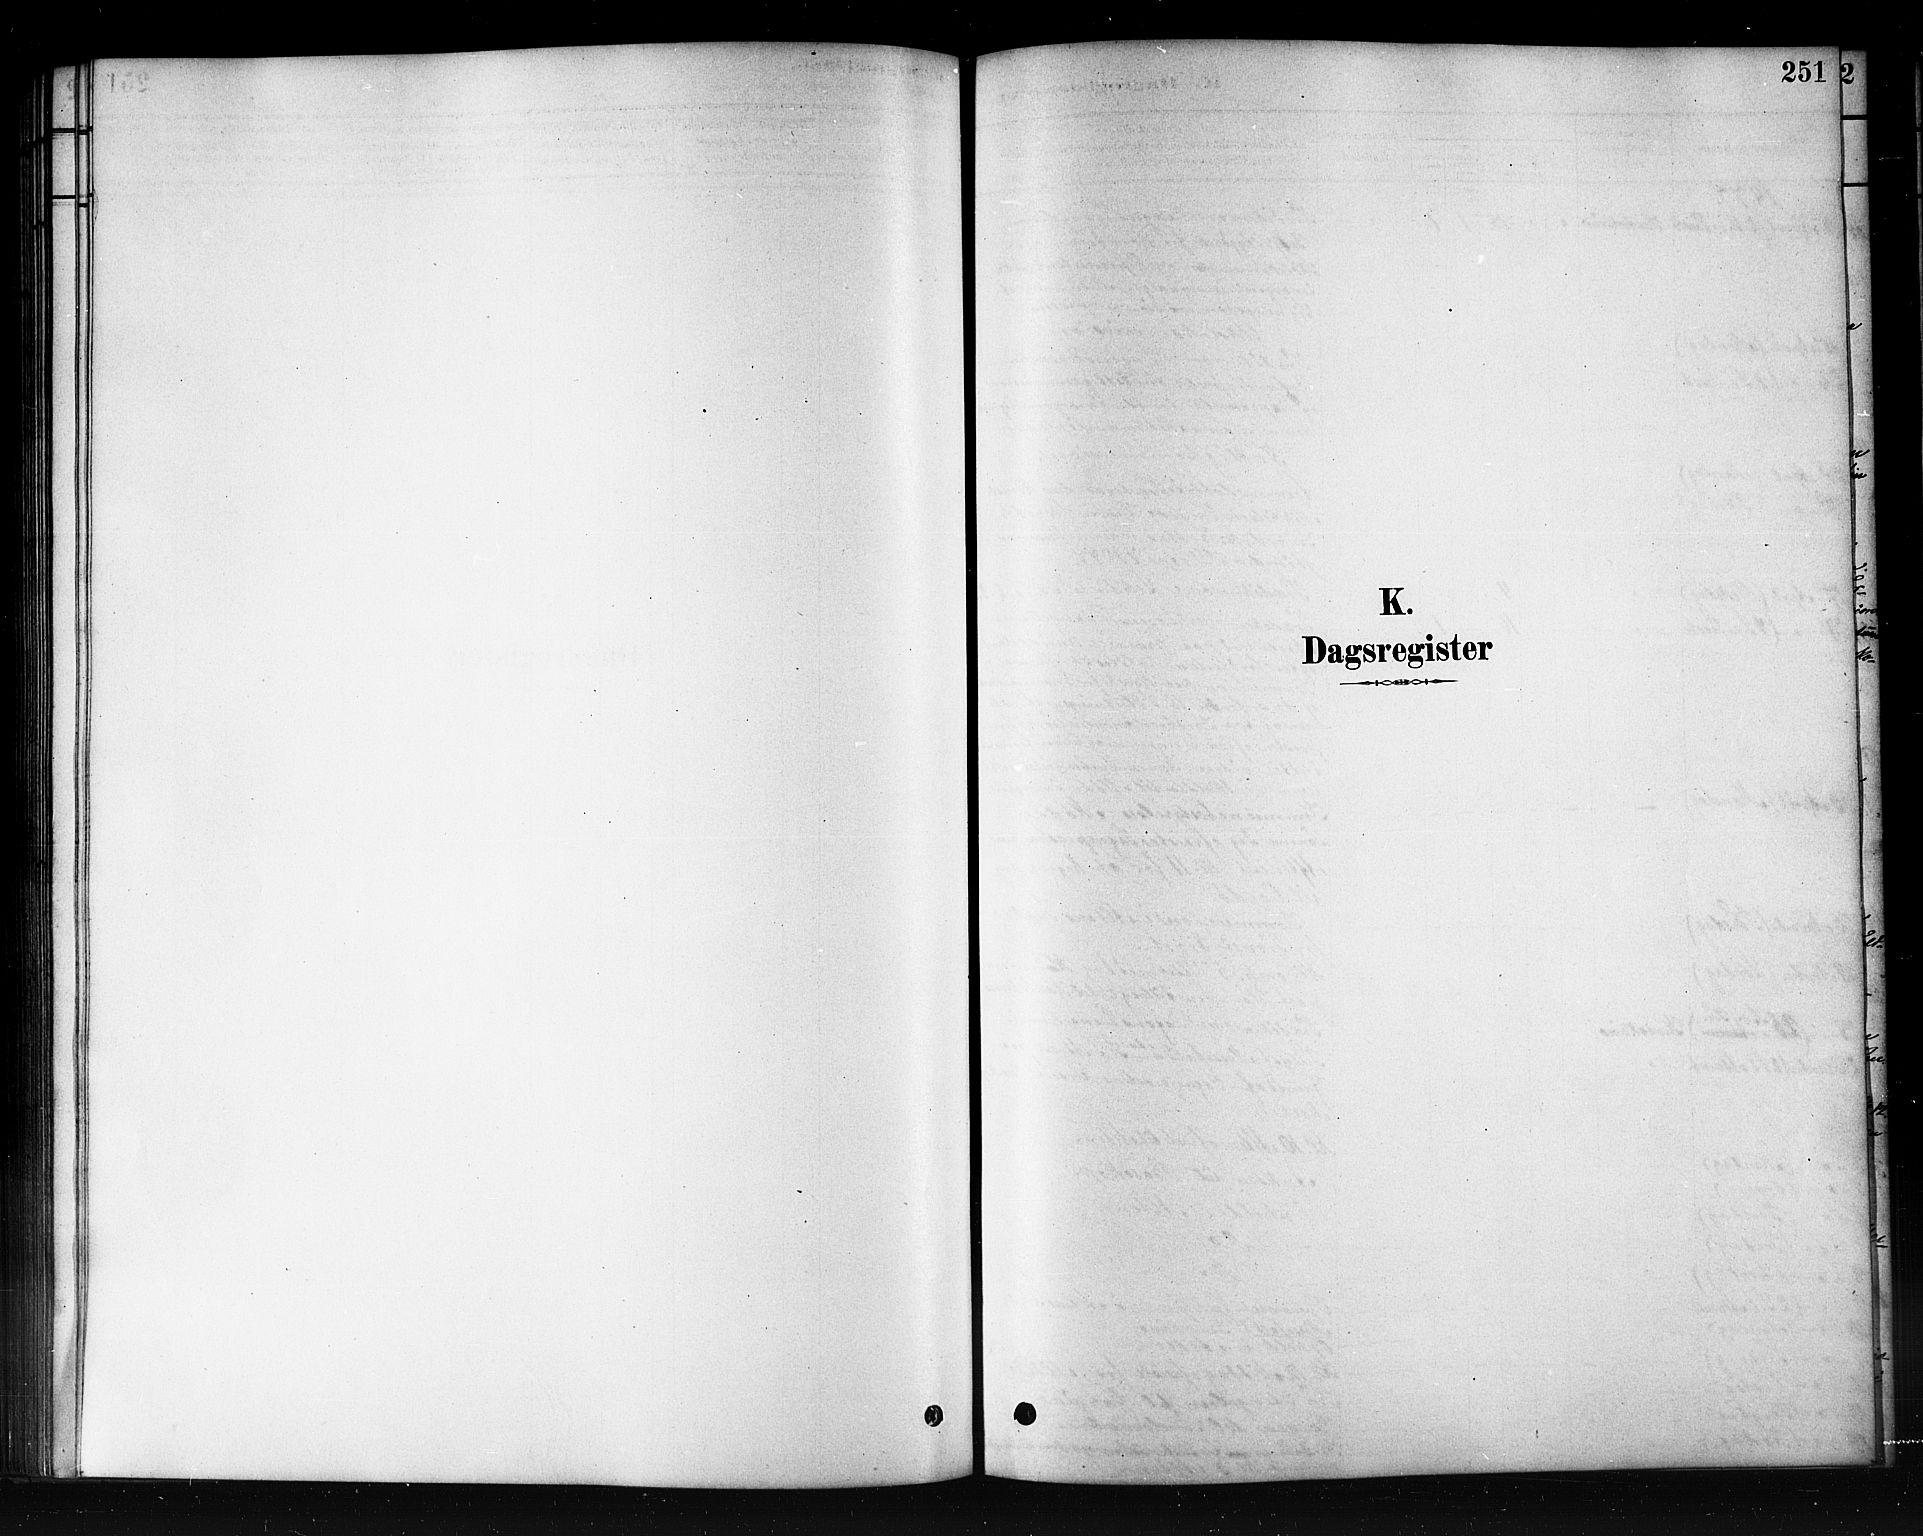 SATØ, Kautokeino sokneprestembete, H/Hb/L0002.klokk: Klokkerbok nr. 2, 1877-1896, s. 251